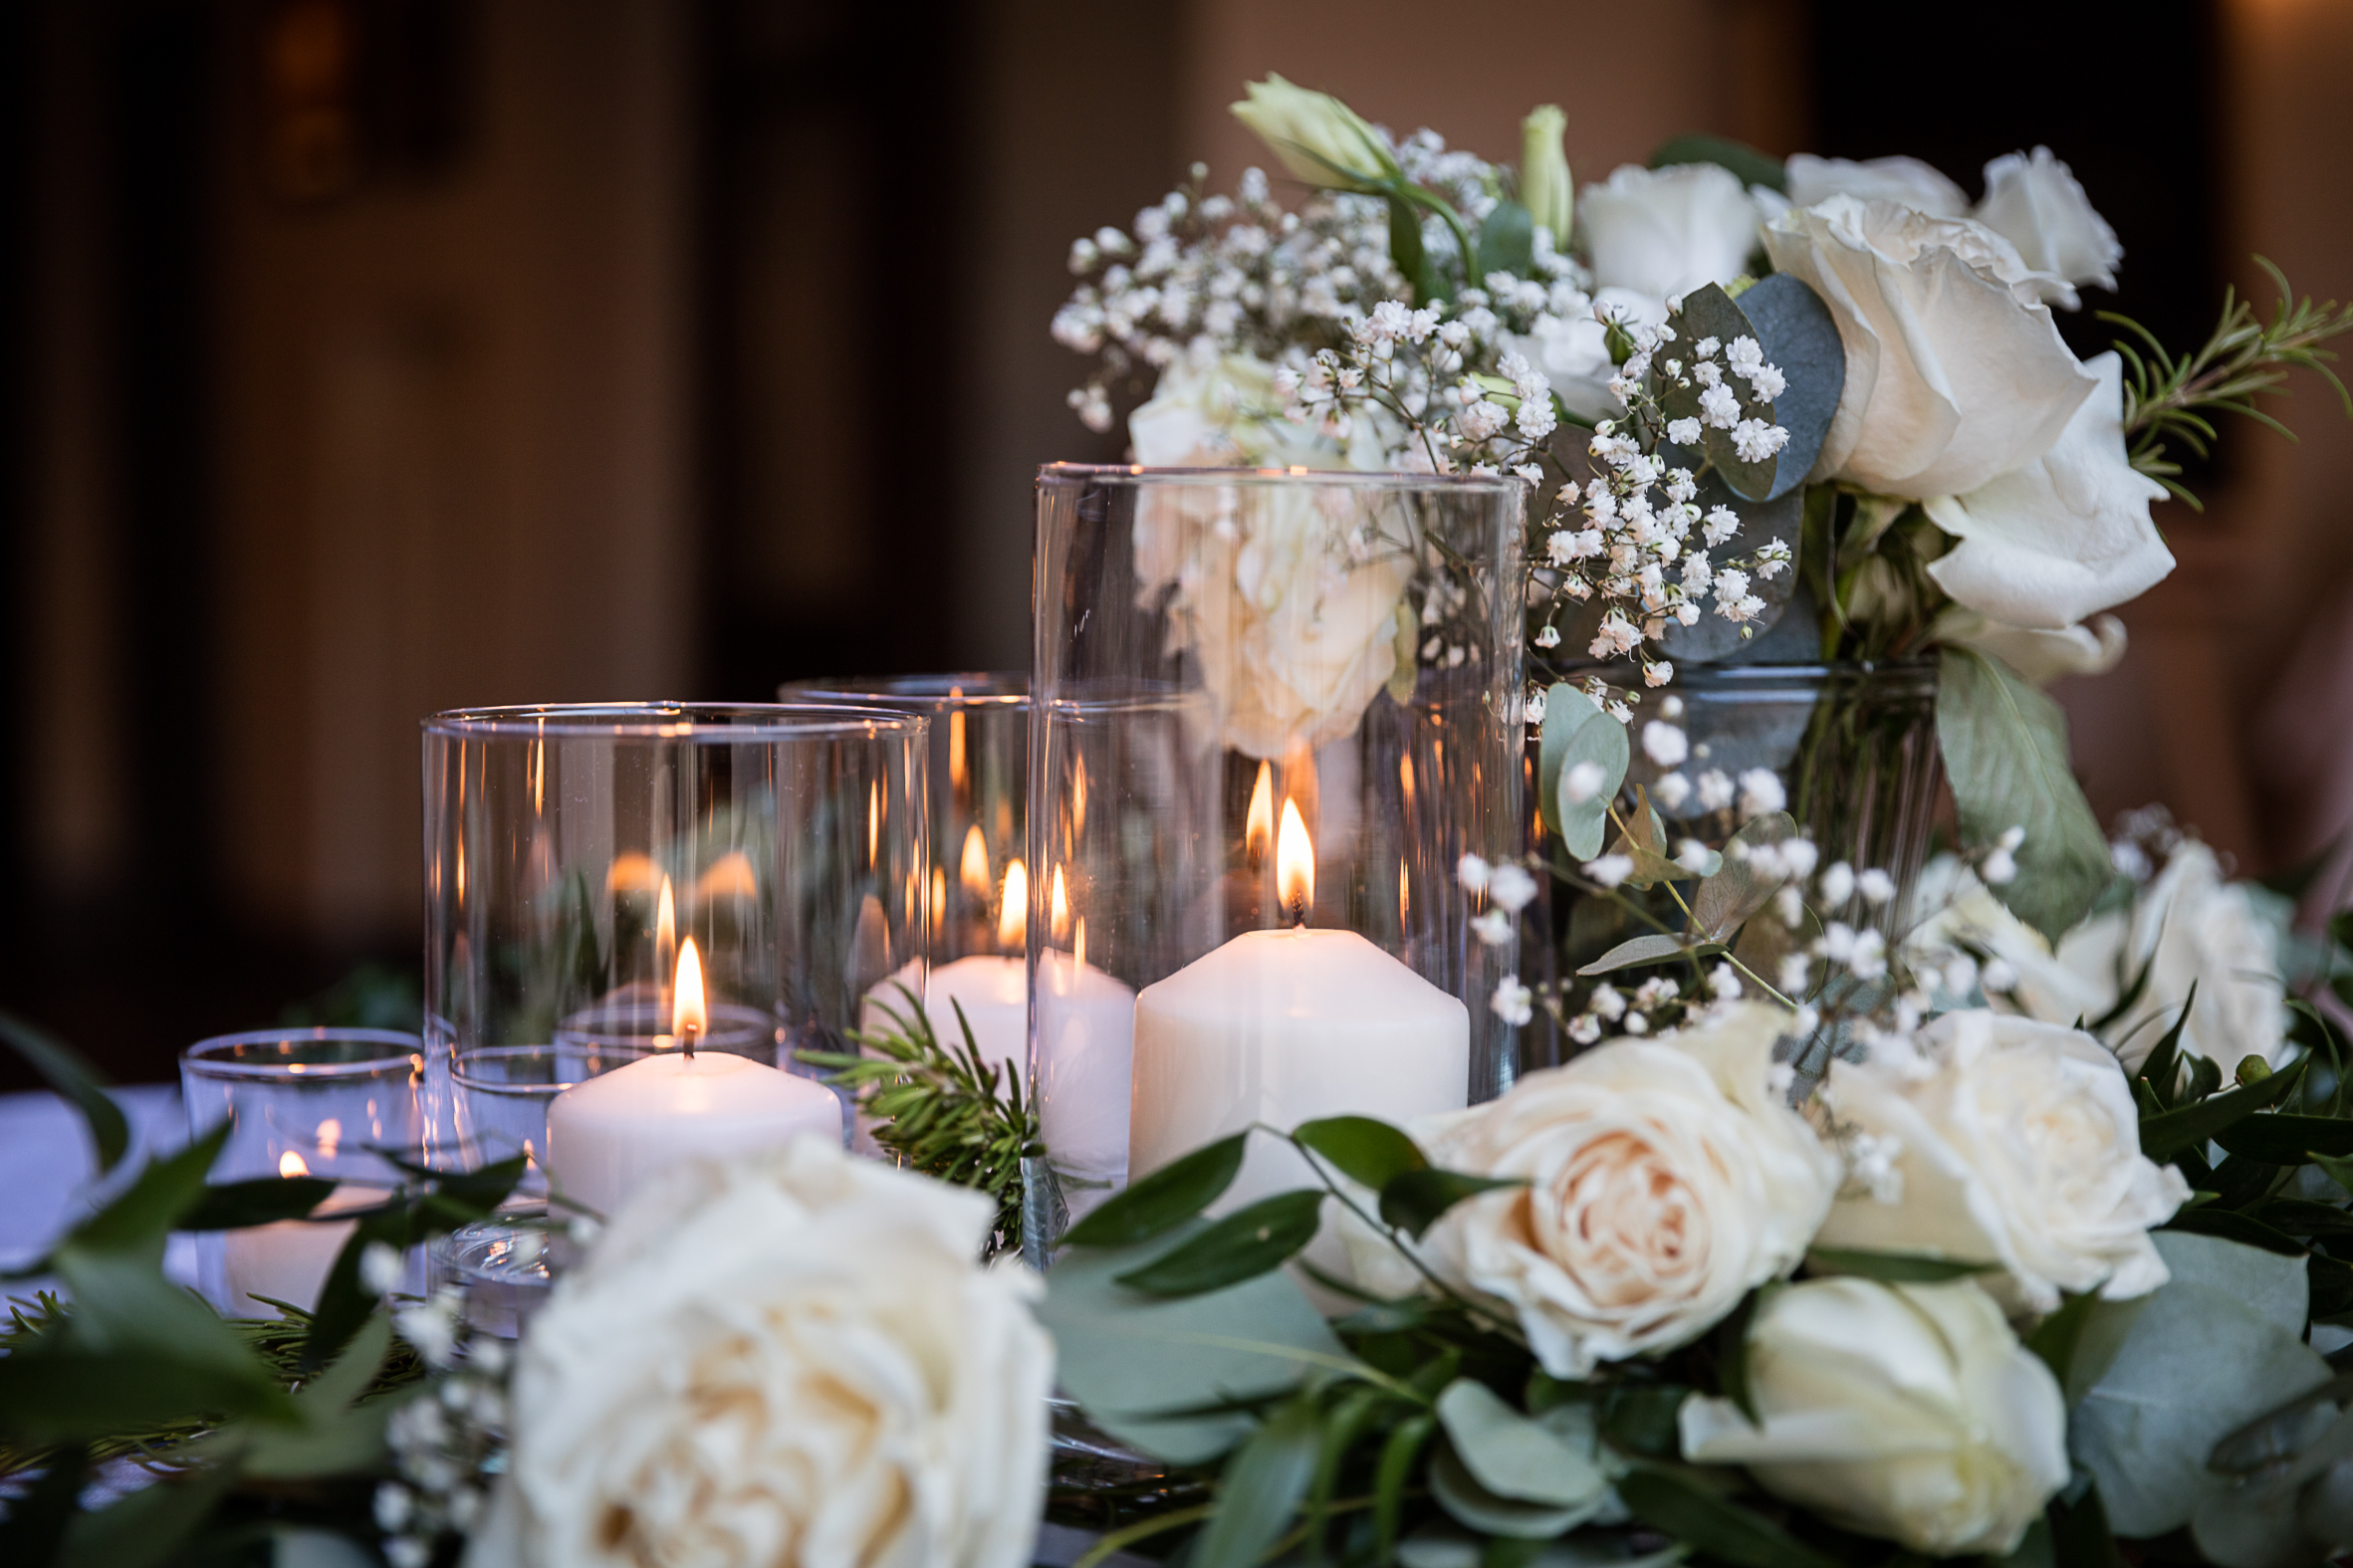 Hochzeit Andrea und Dario_Toskana 2017_217_a4.jpg